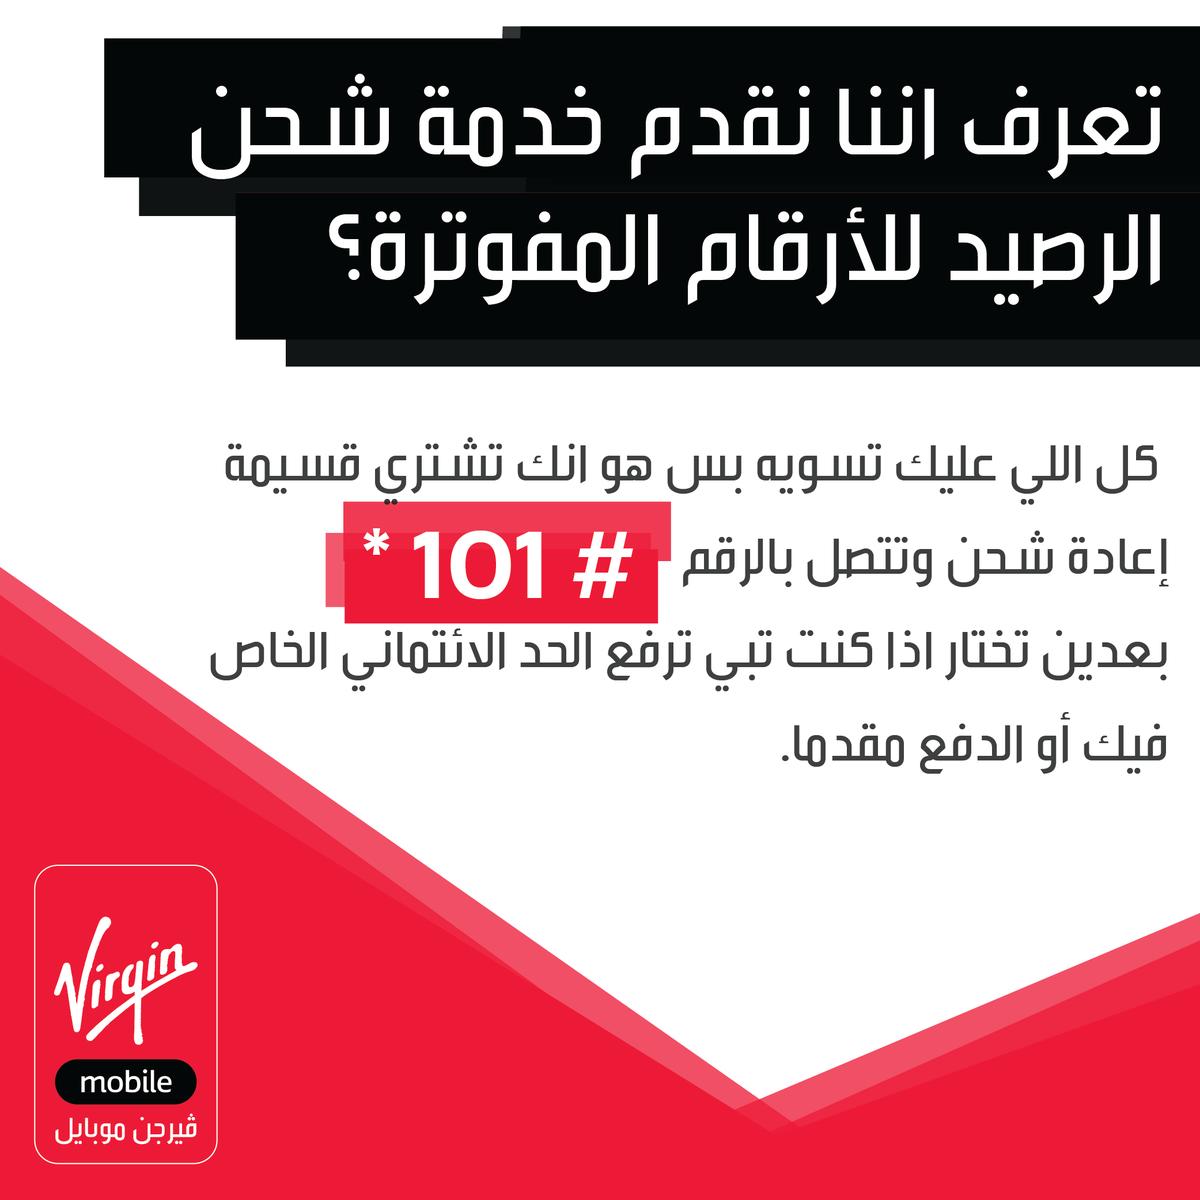 Virginmobileksa On Twitter Nawaf05511 والرياض جاليري وحياة مول وبرج المملكة وبانوراما مول سعيدين بخدمتك أتمنى لك يوم جميل